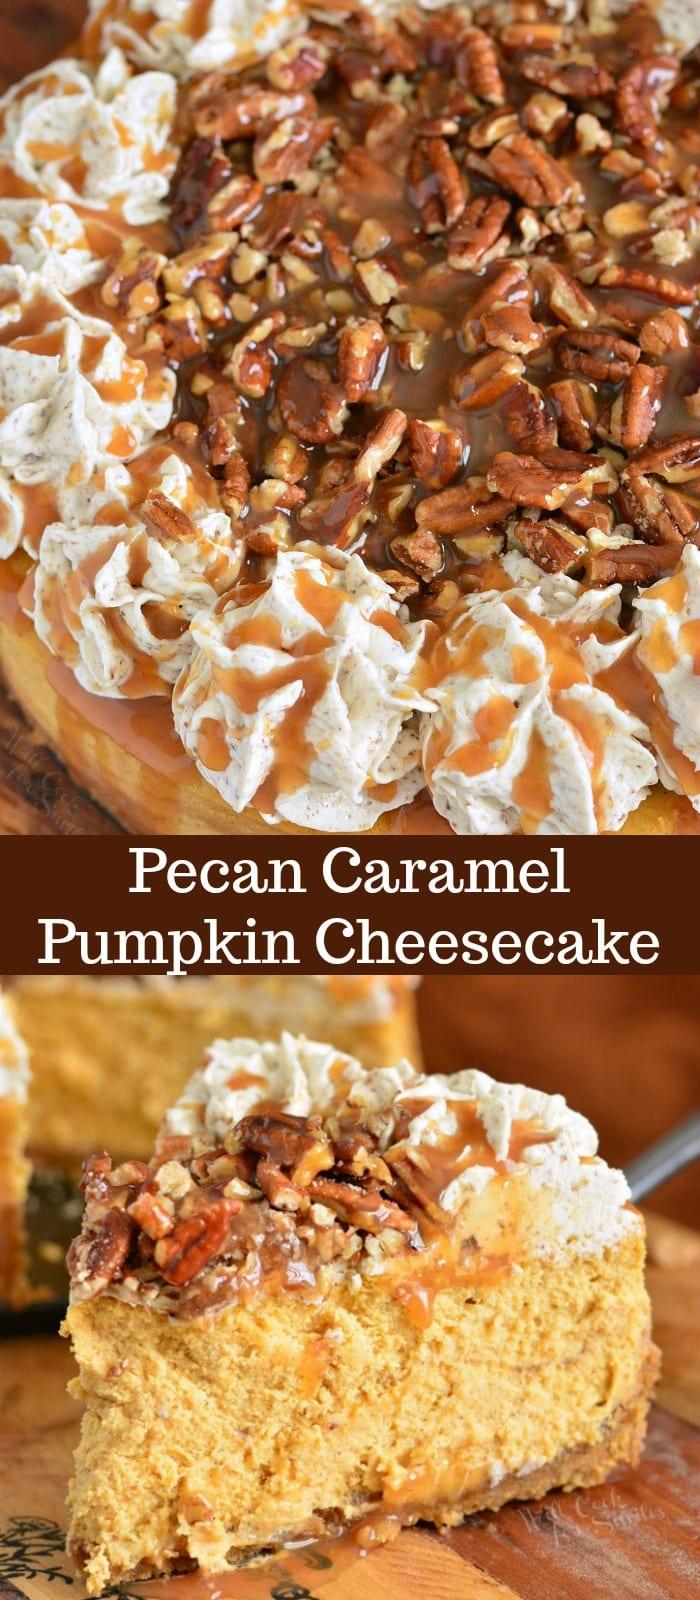 Pecan Caramel Pumpkin Cheesecake on collage